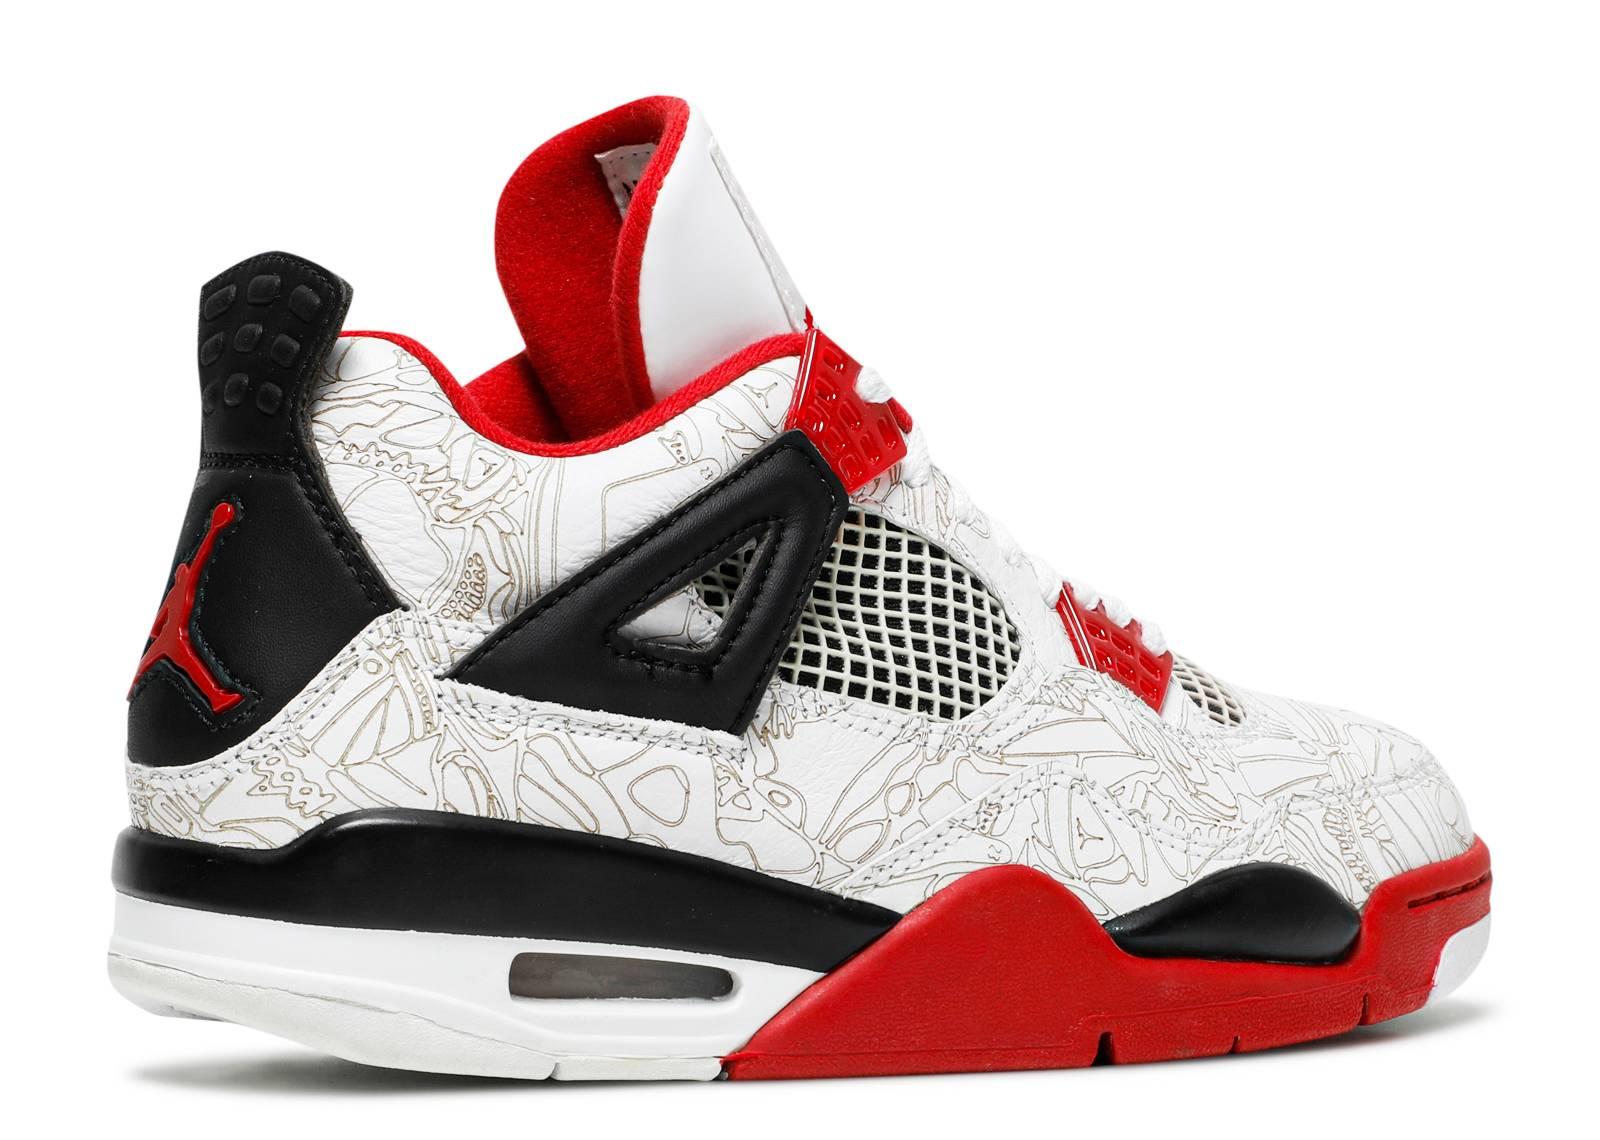 Air Jordan 4 Blanc / Fac Pointeur Laser Rouge-noir